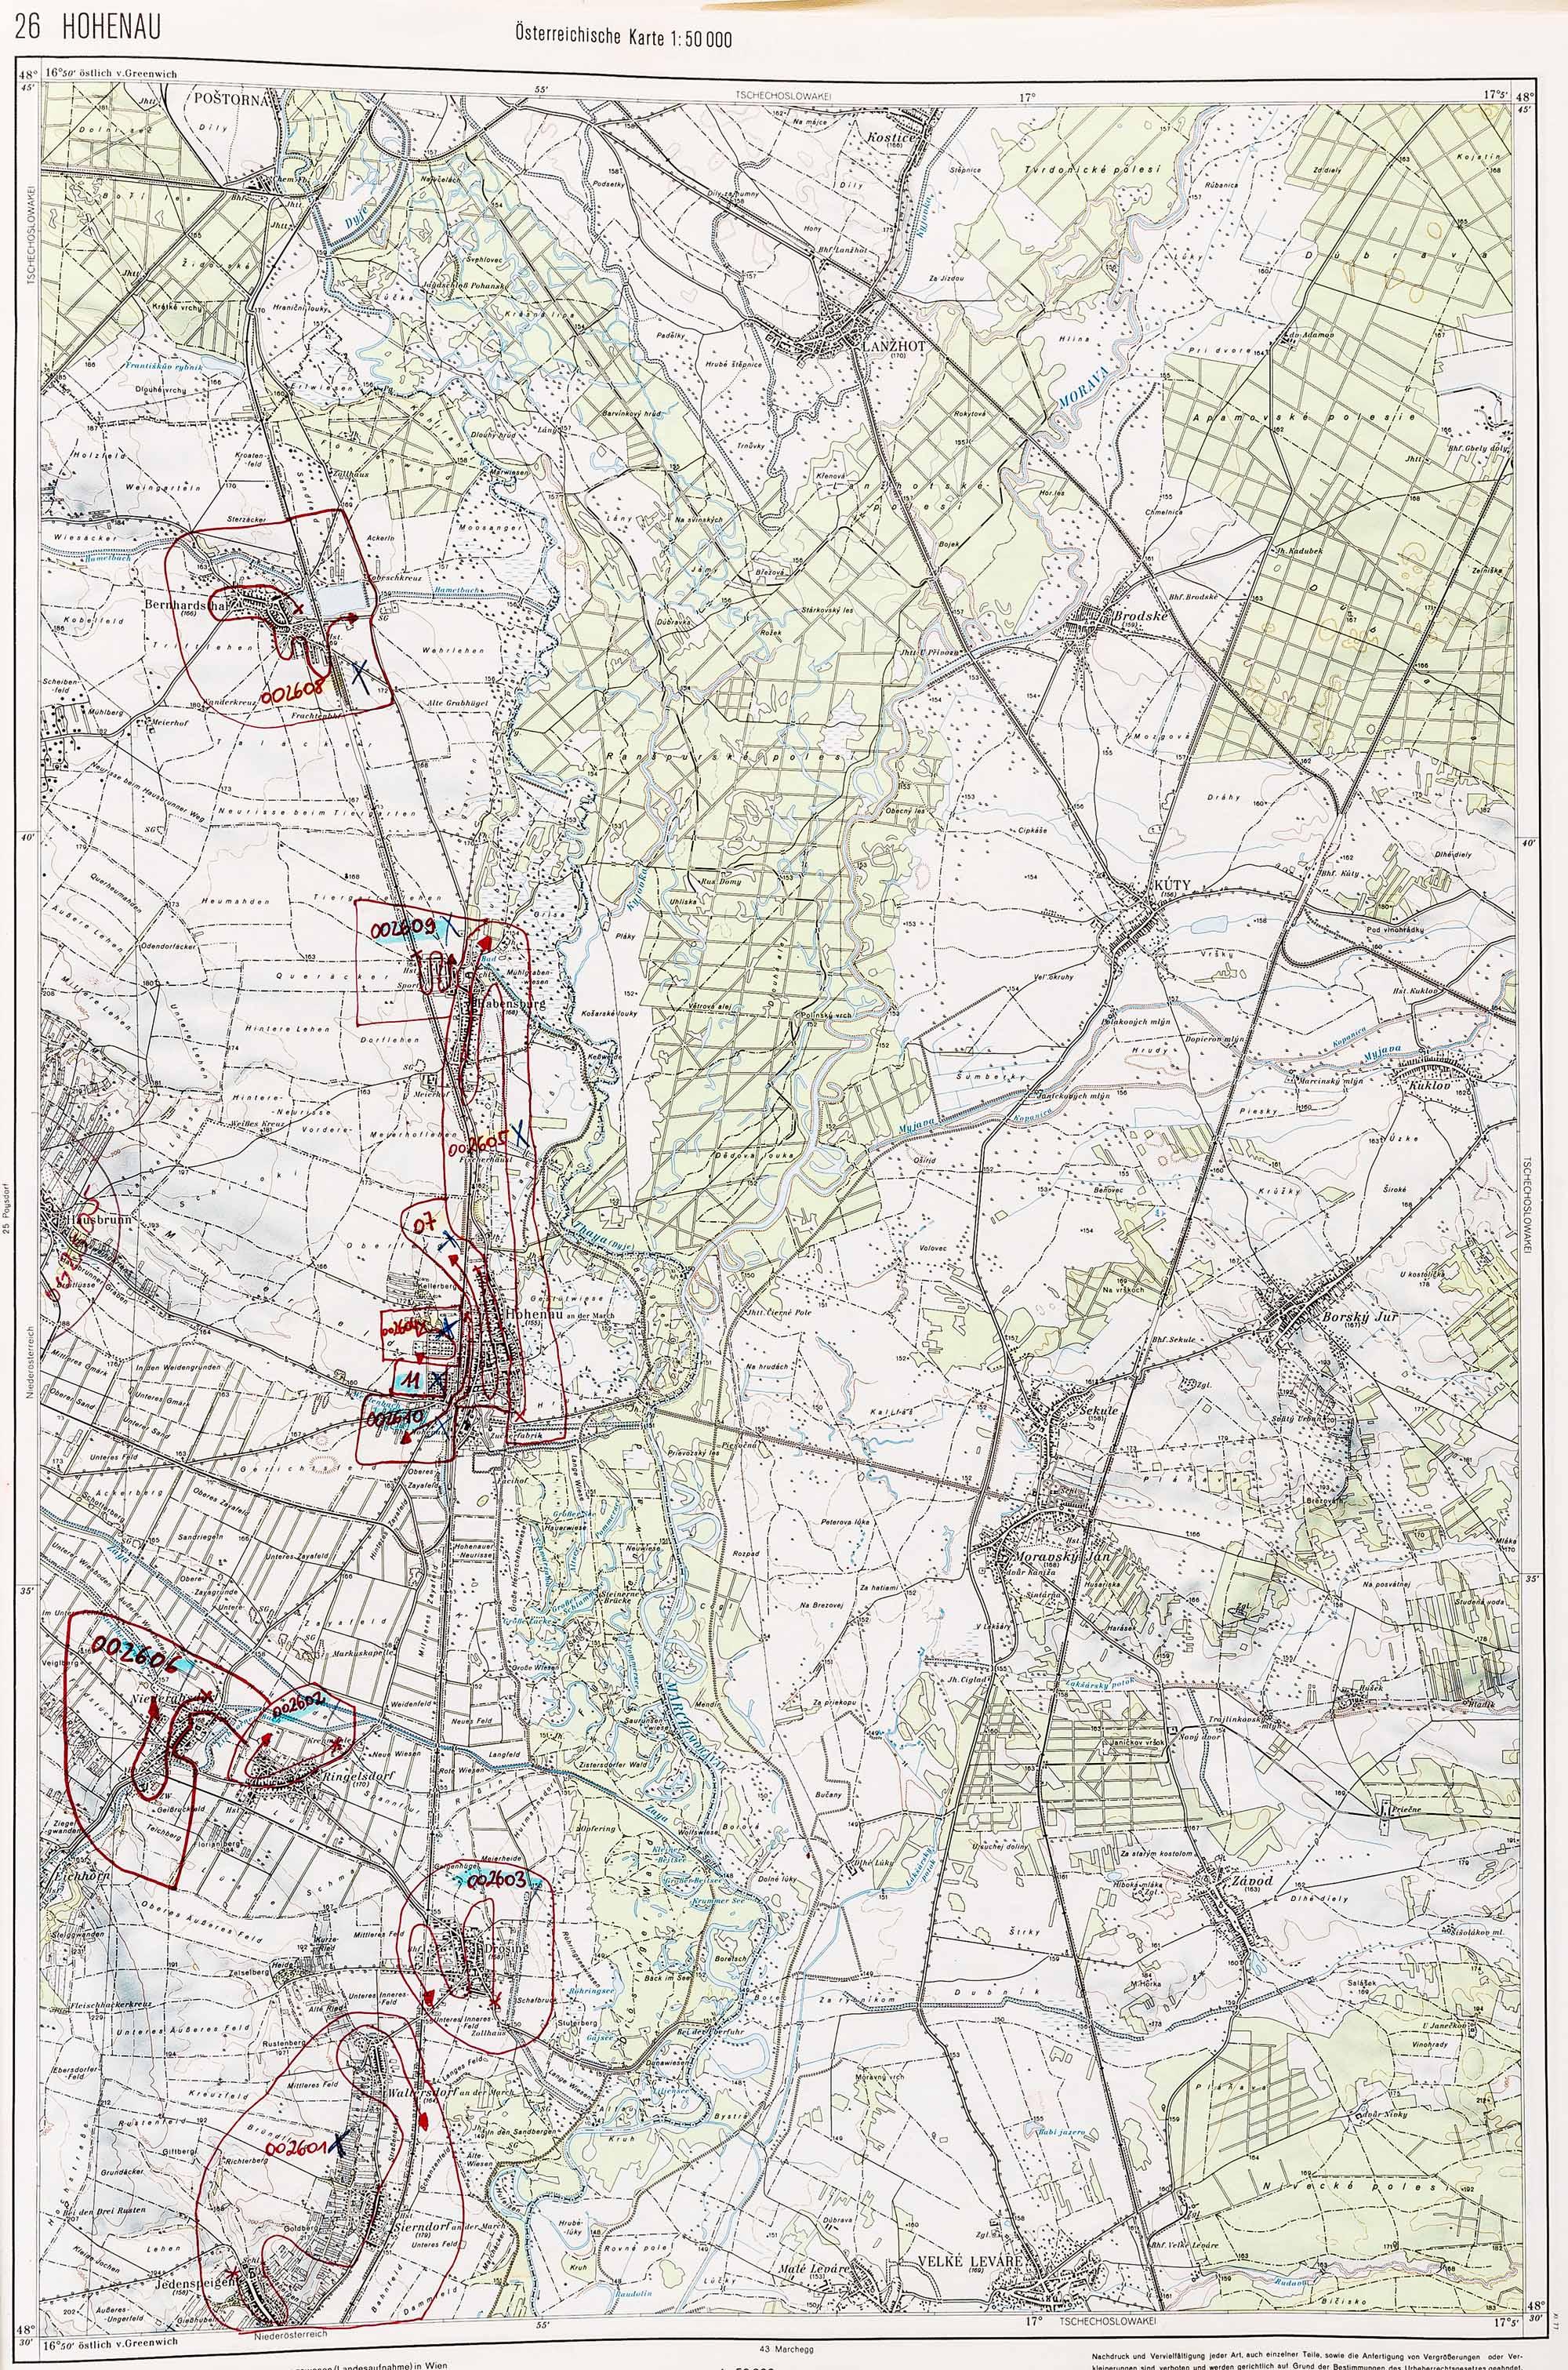 1979-1982 Karte 026